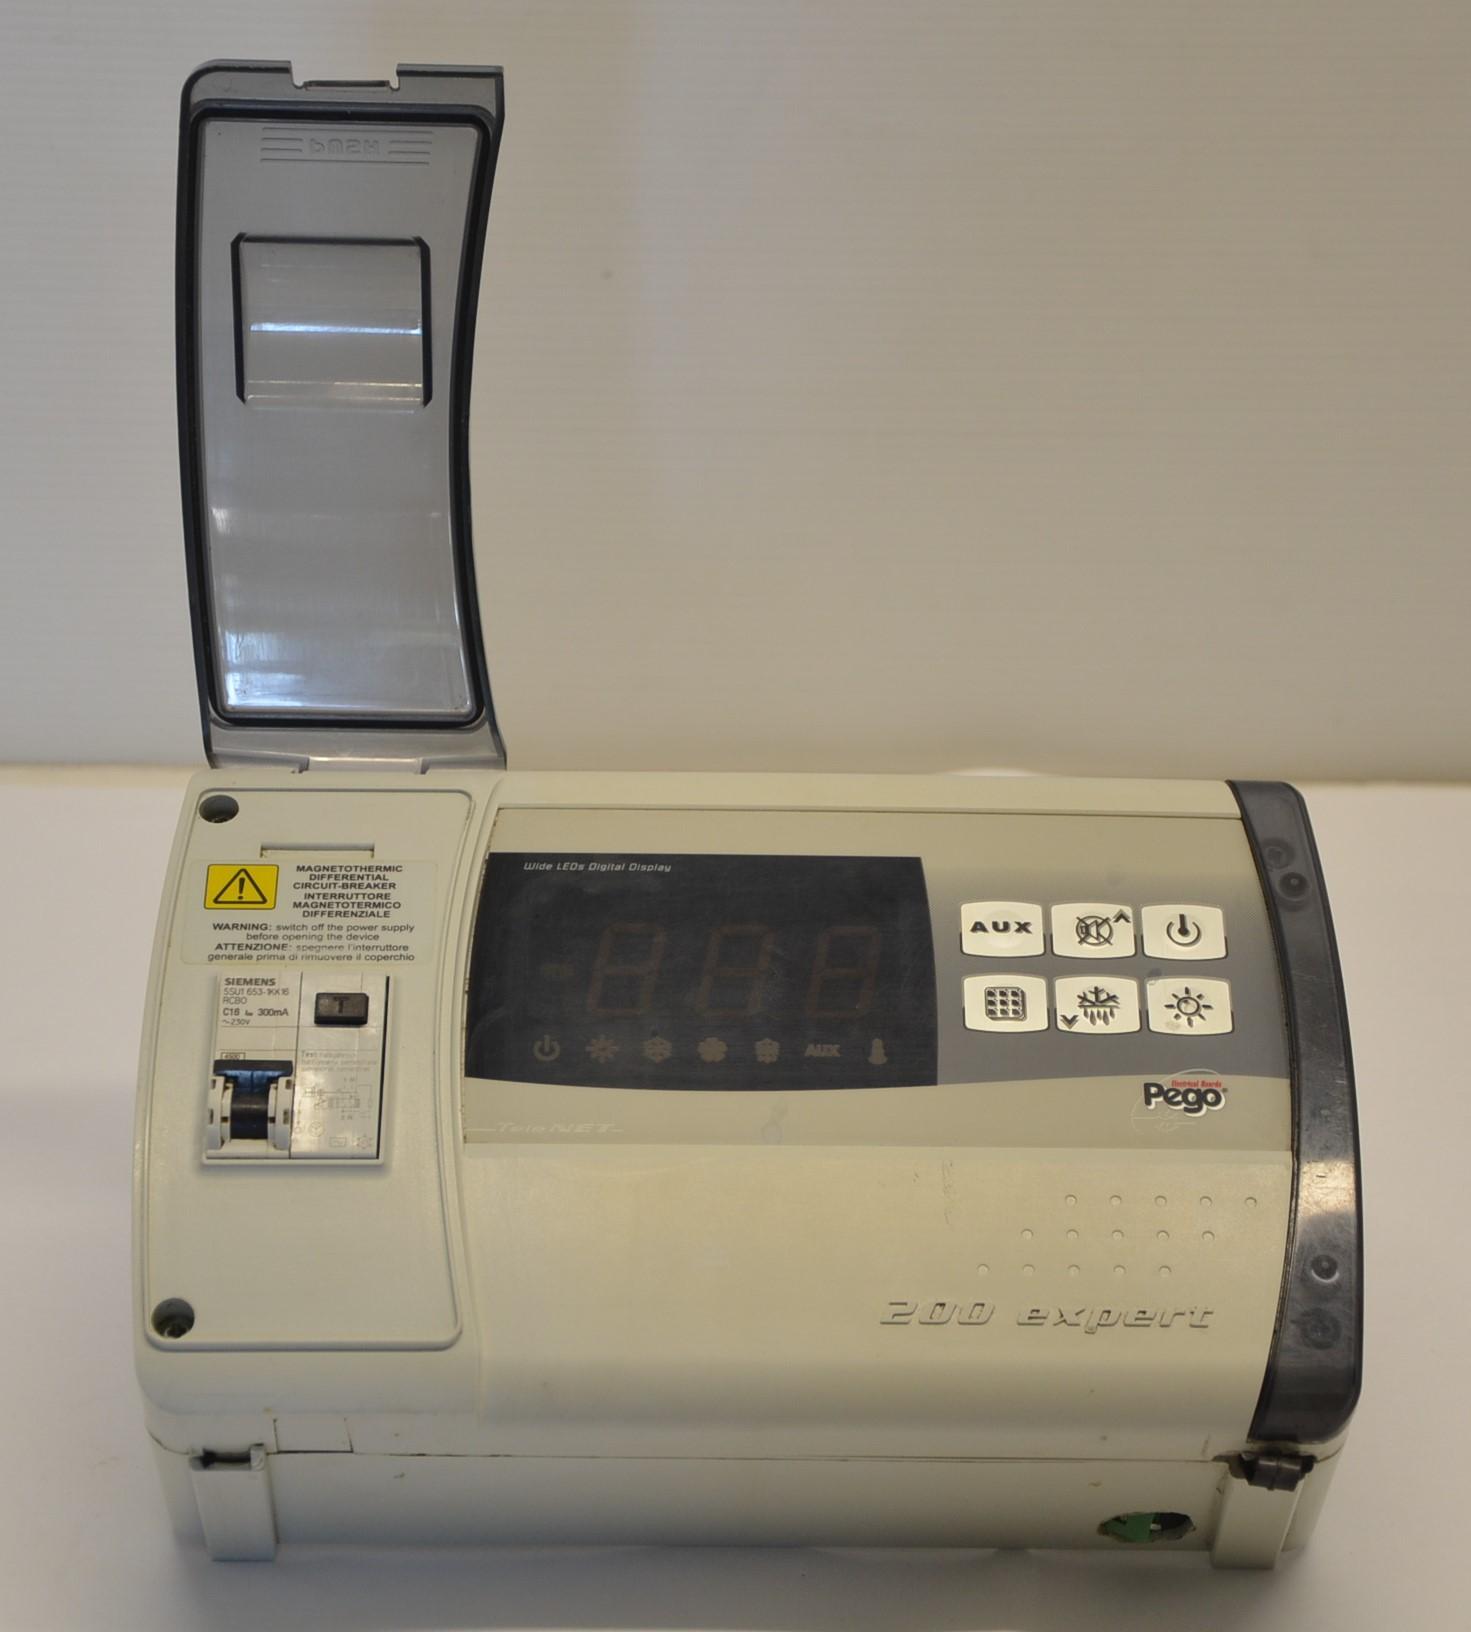 Quadro elettrico - Pego serie 200 Expert 200200EXPCS in vendita - foto 1